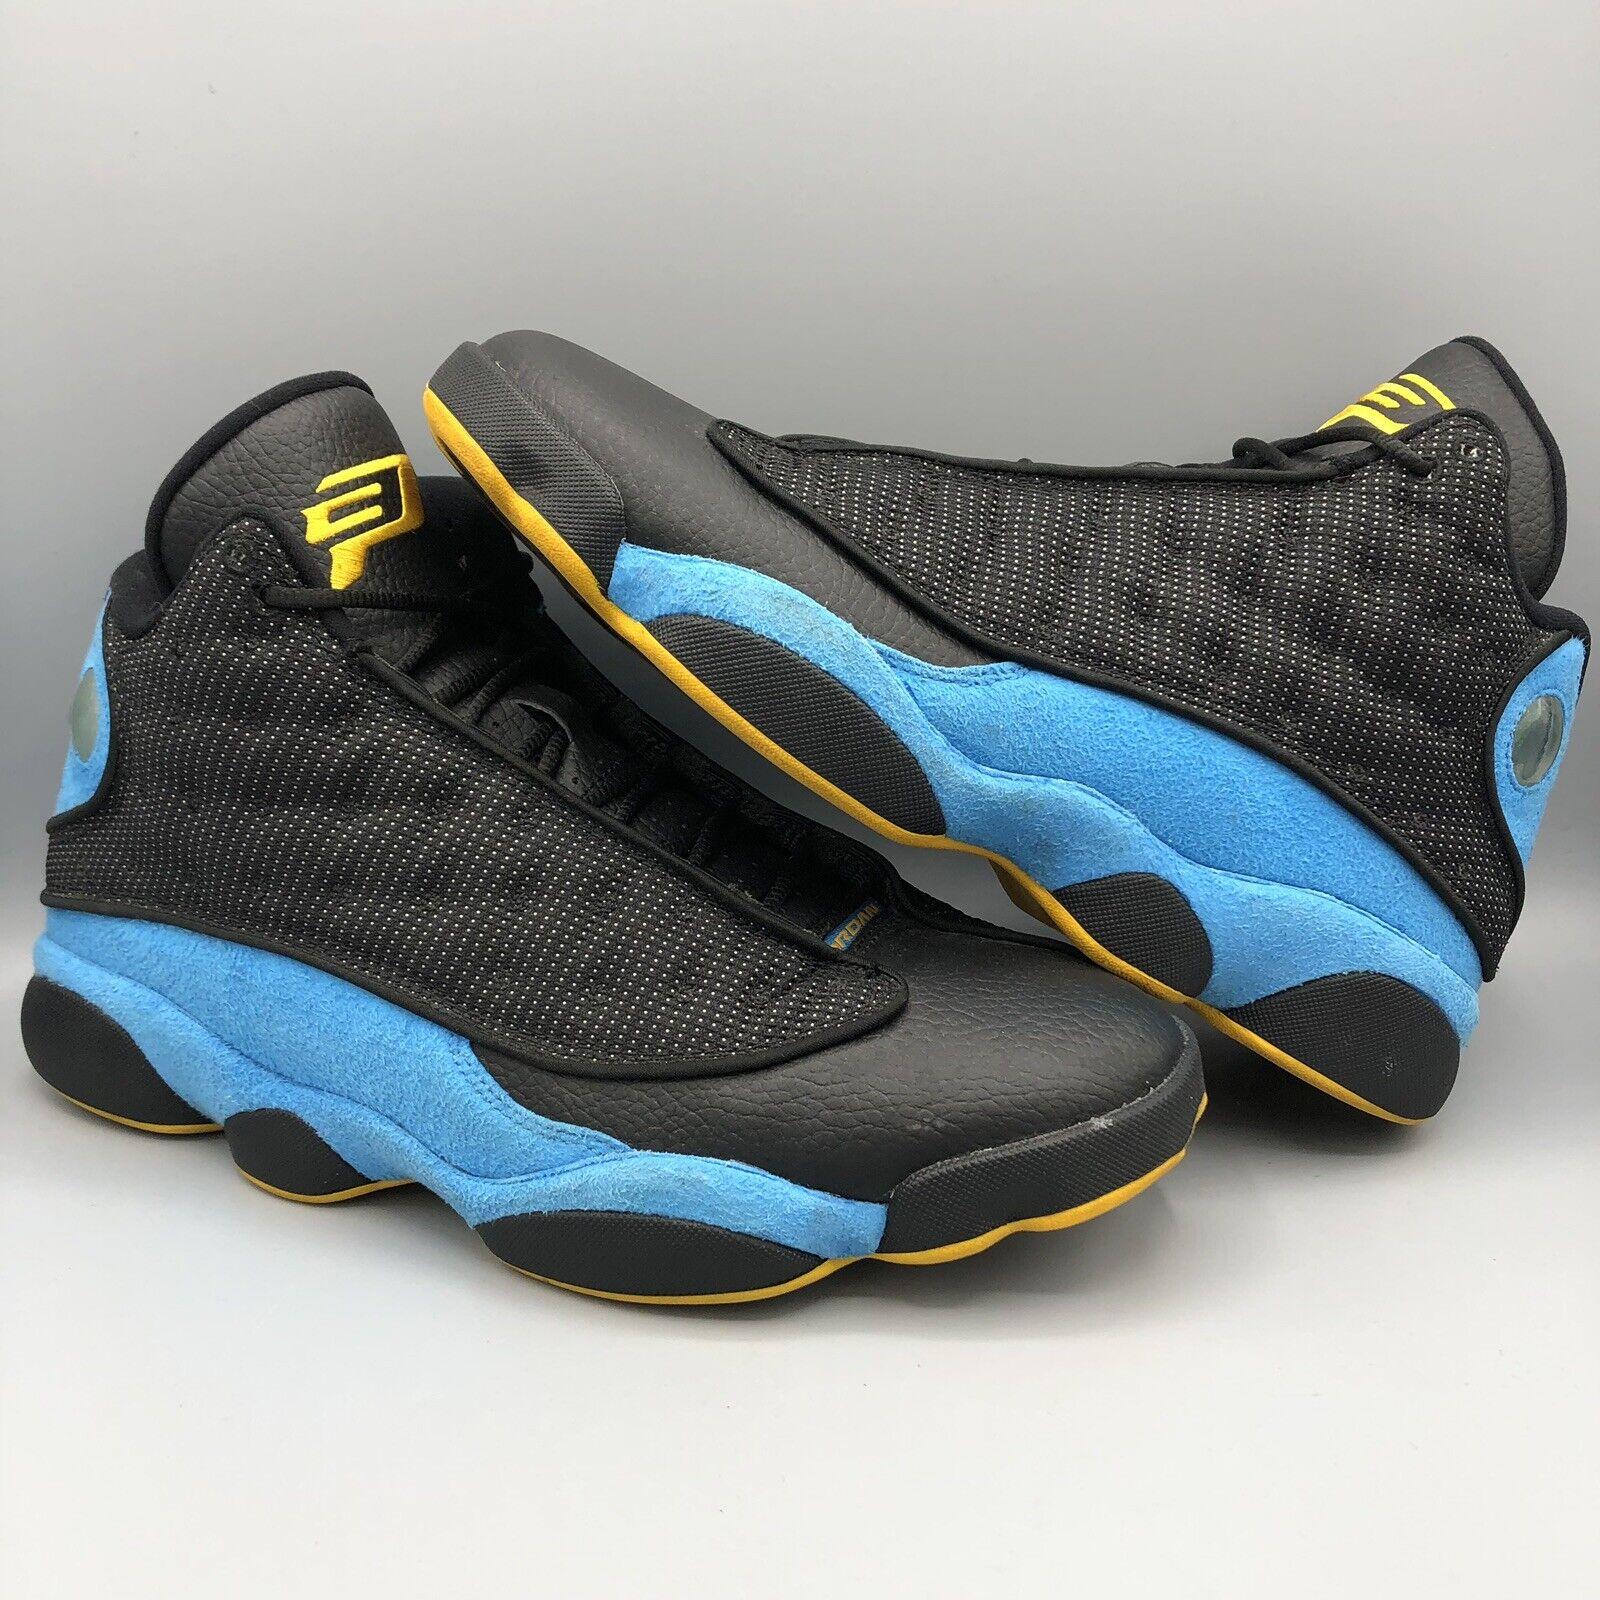 Nike Air Jordan Retro XIII CP3 Chris Paul Hornets Black bluee SZ 11 PE 823902 015